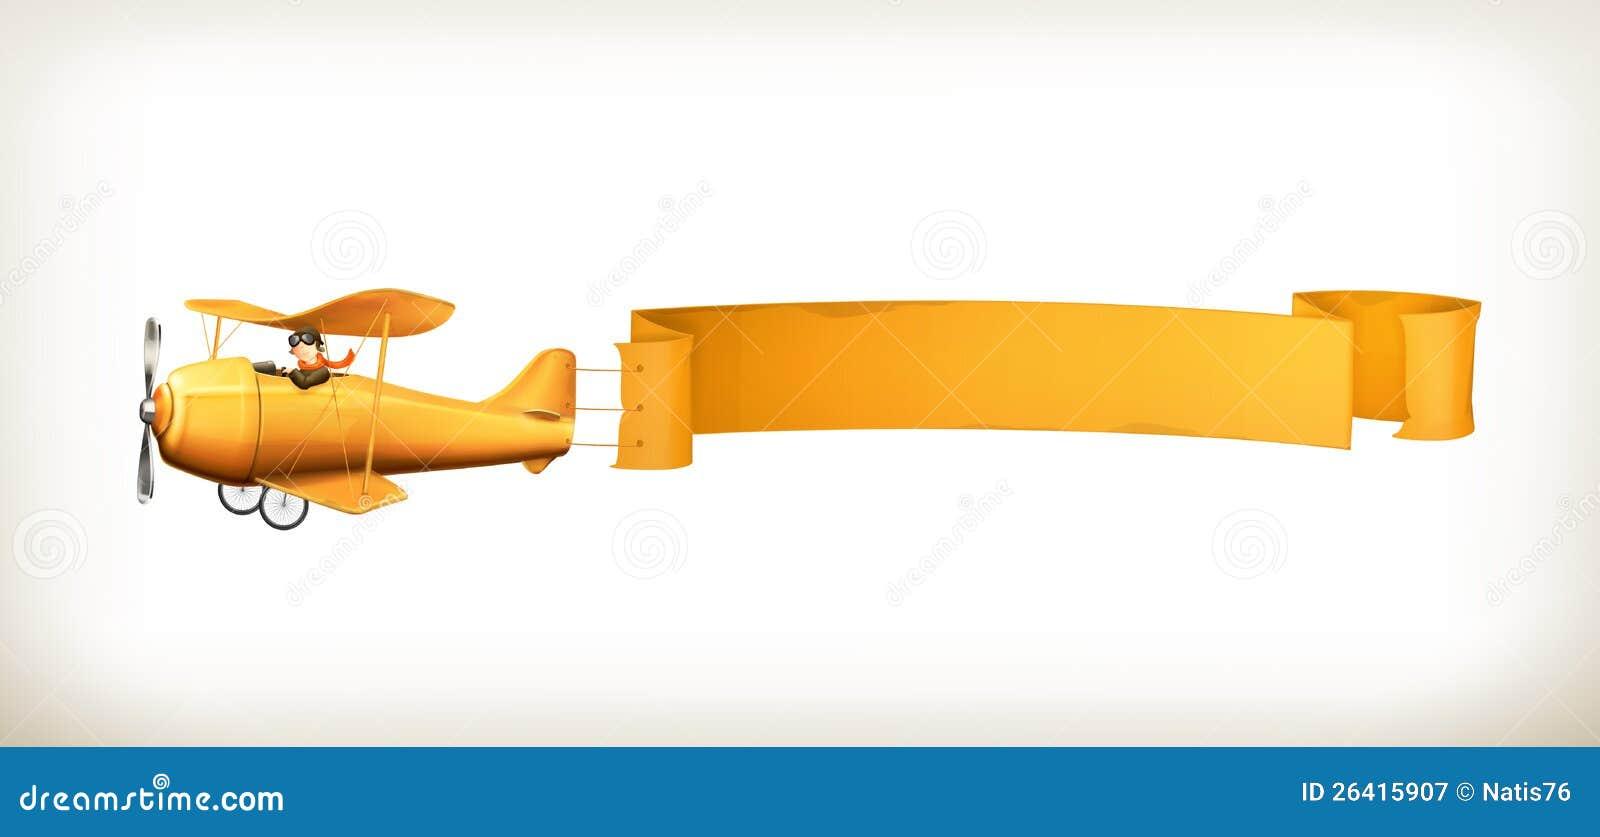 Aircraft Banner Stock Vector Illustration Of Biplane